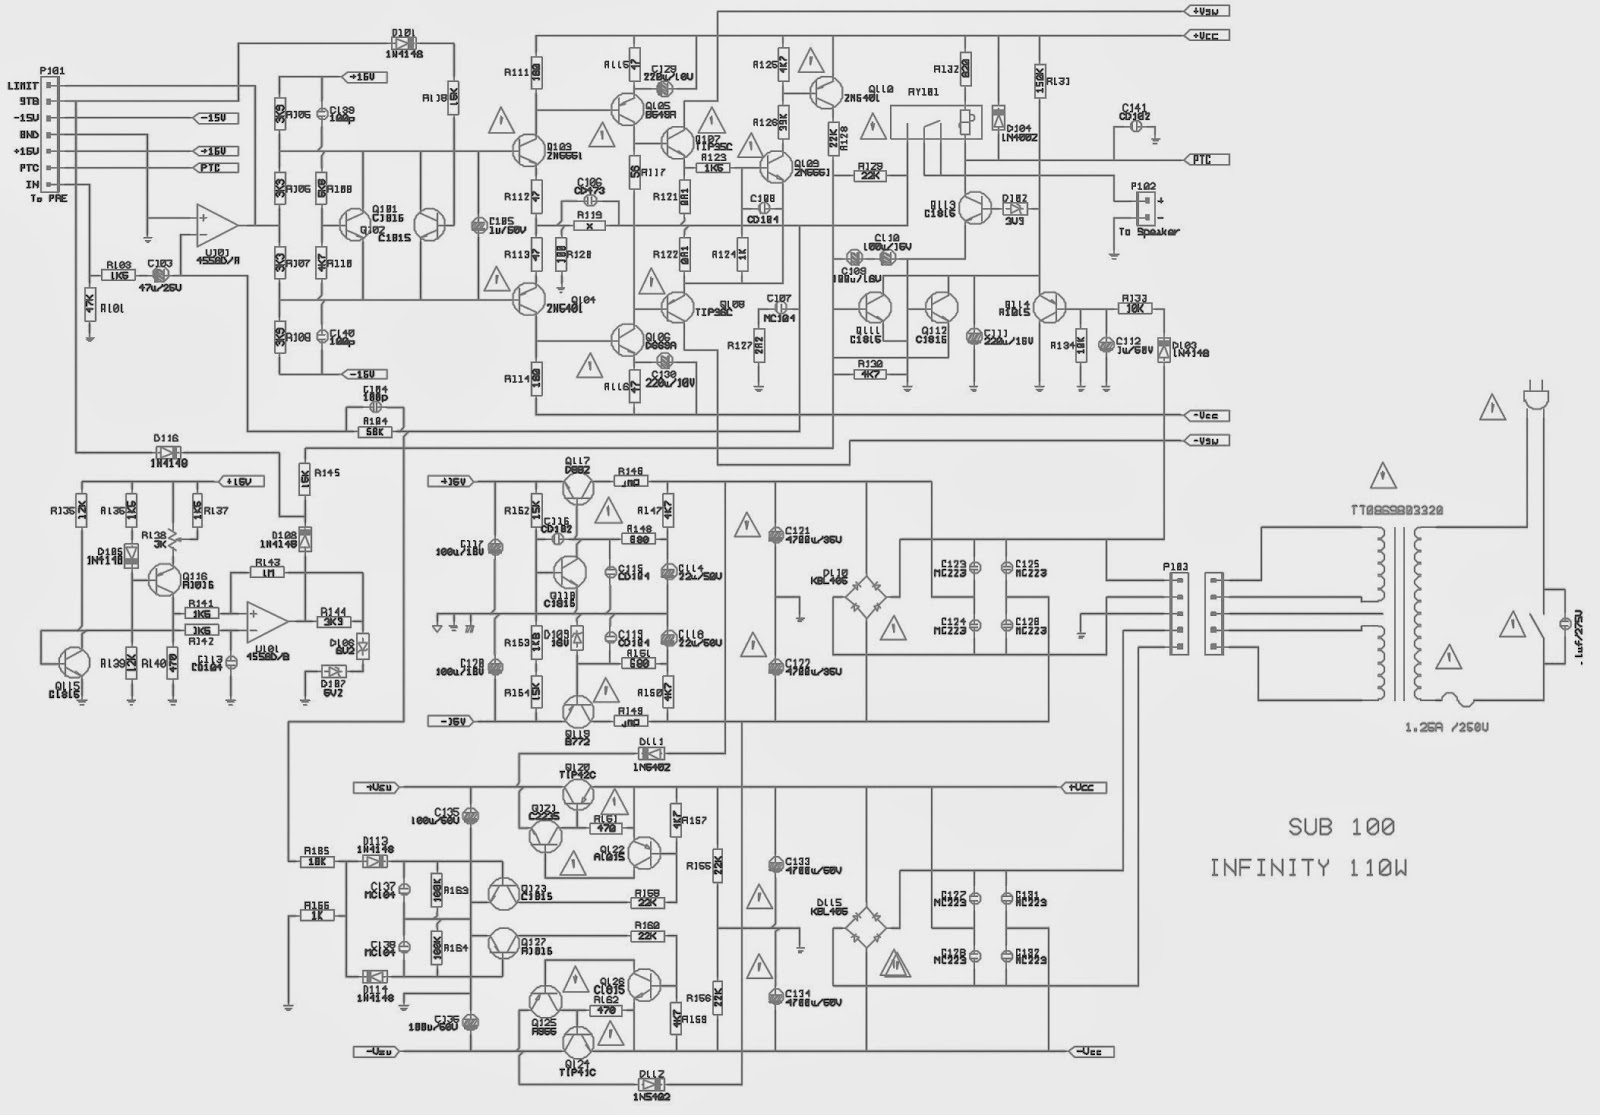 infinity primus - sub-woofer